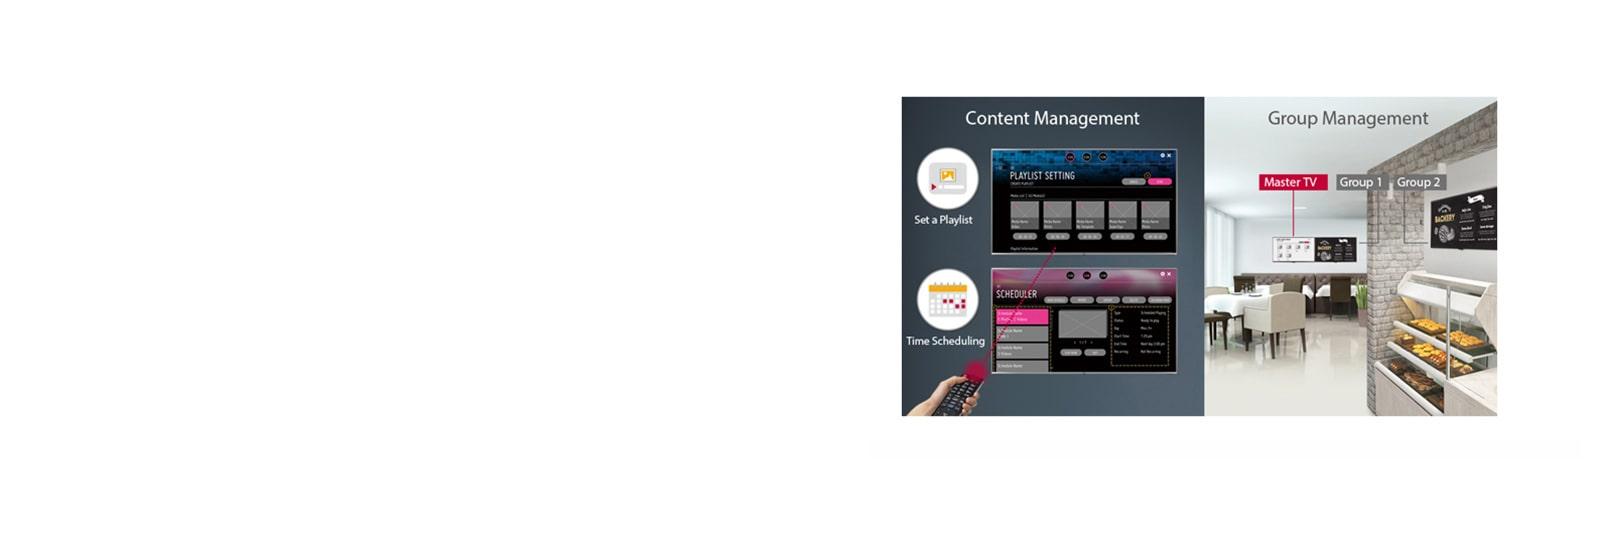 86UU640C_Commercial_Lite_D02_01_EmbeddedContentManagement&GroupManagement_1541488080597